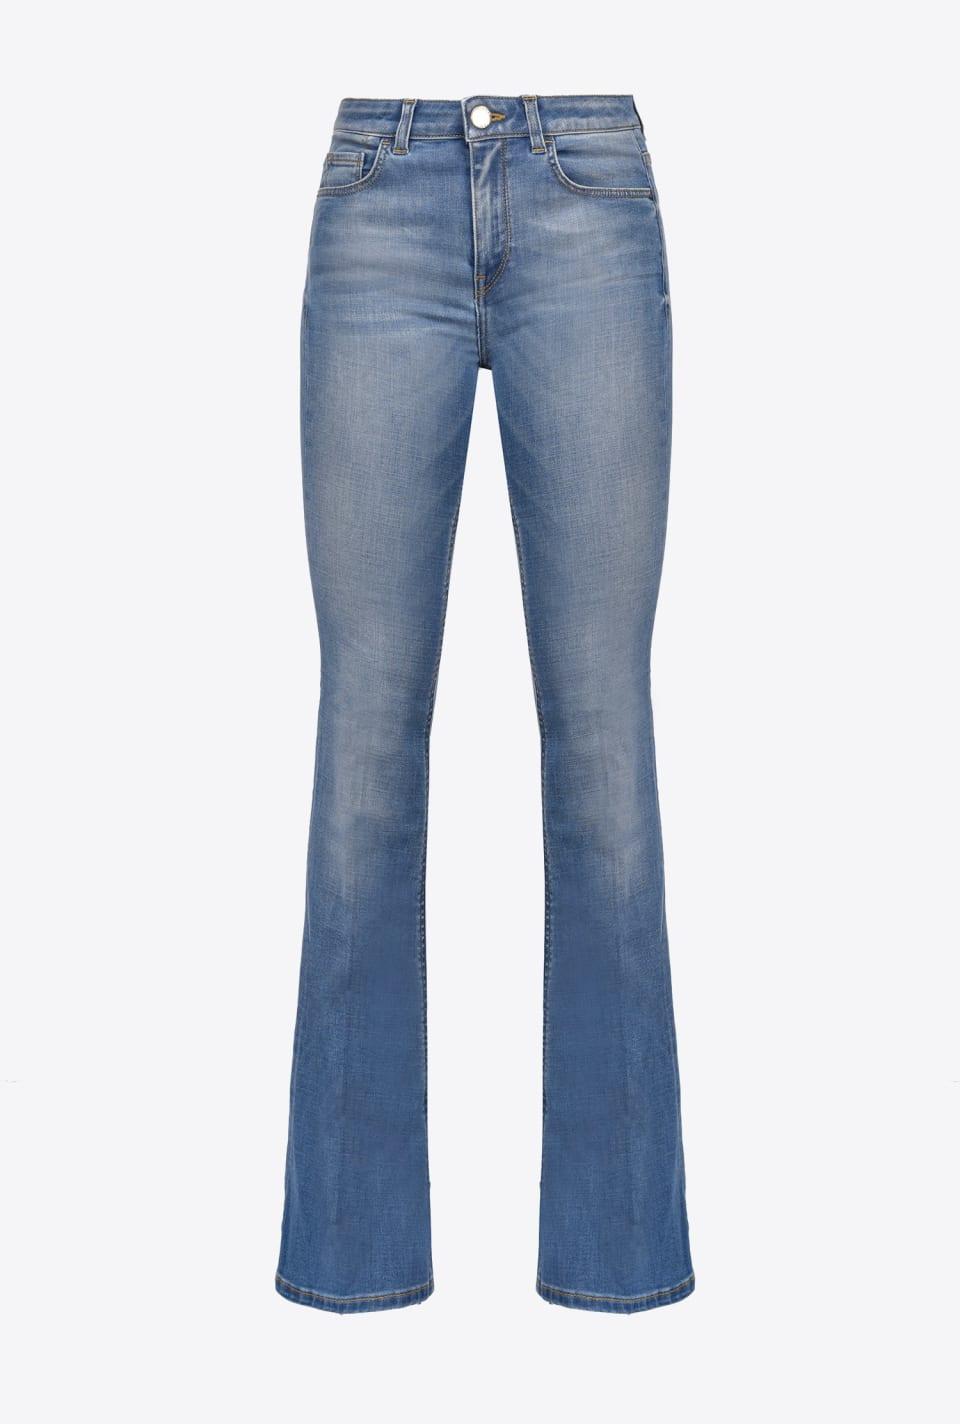 Flare-Fit-Jeans aus Soft-Denim - Pinko